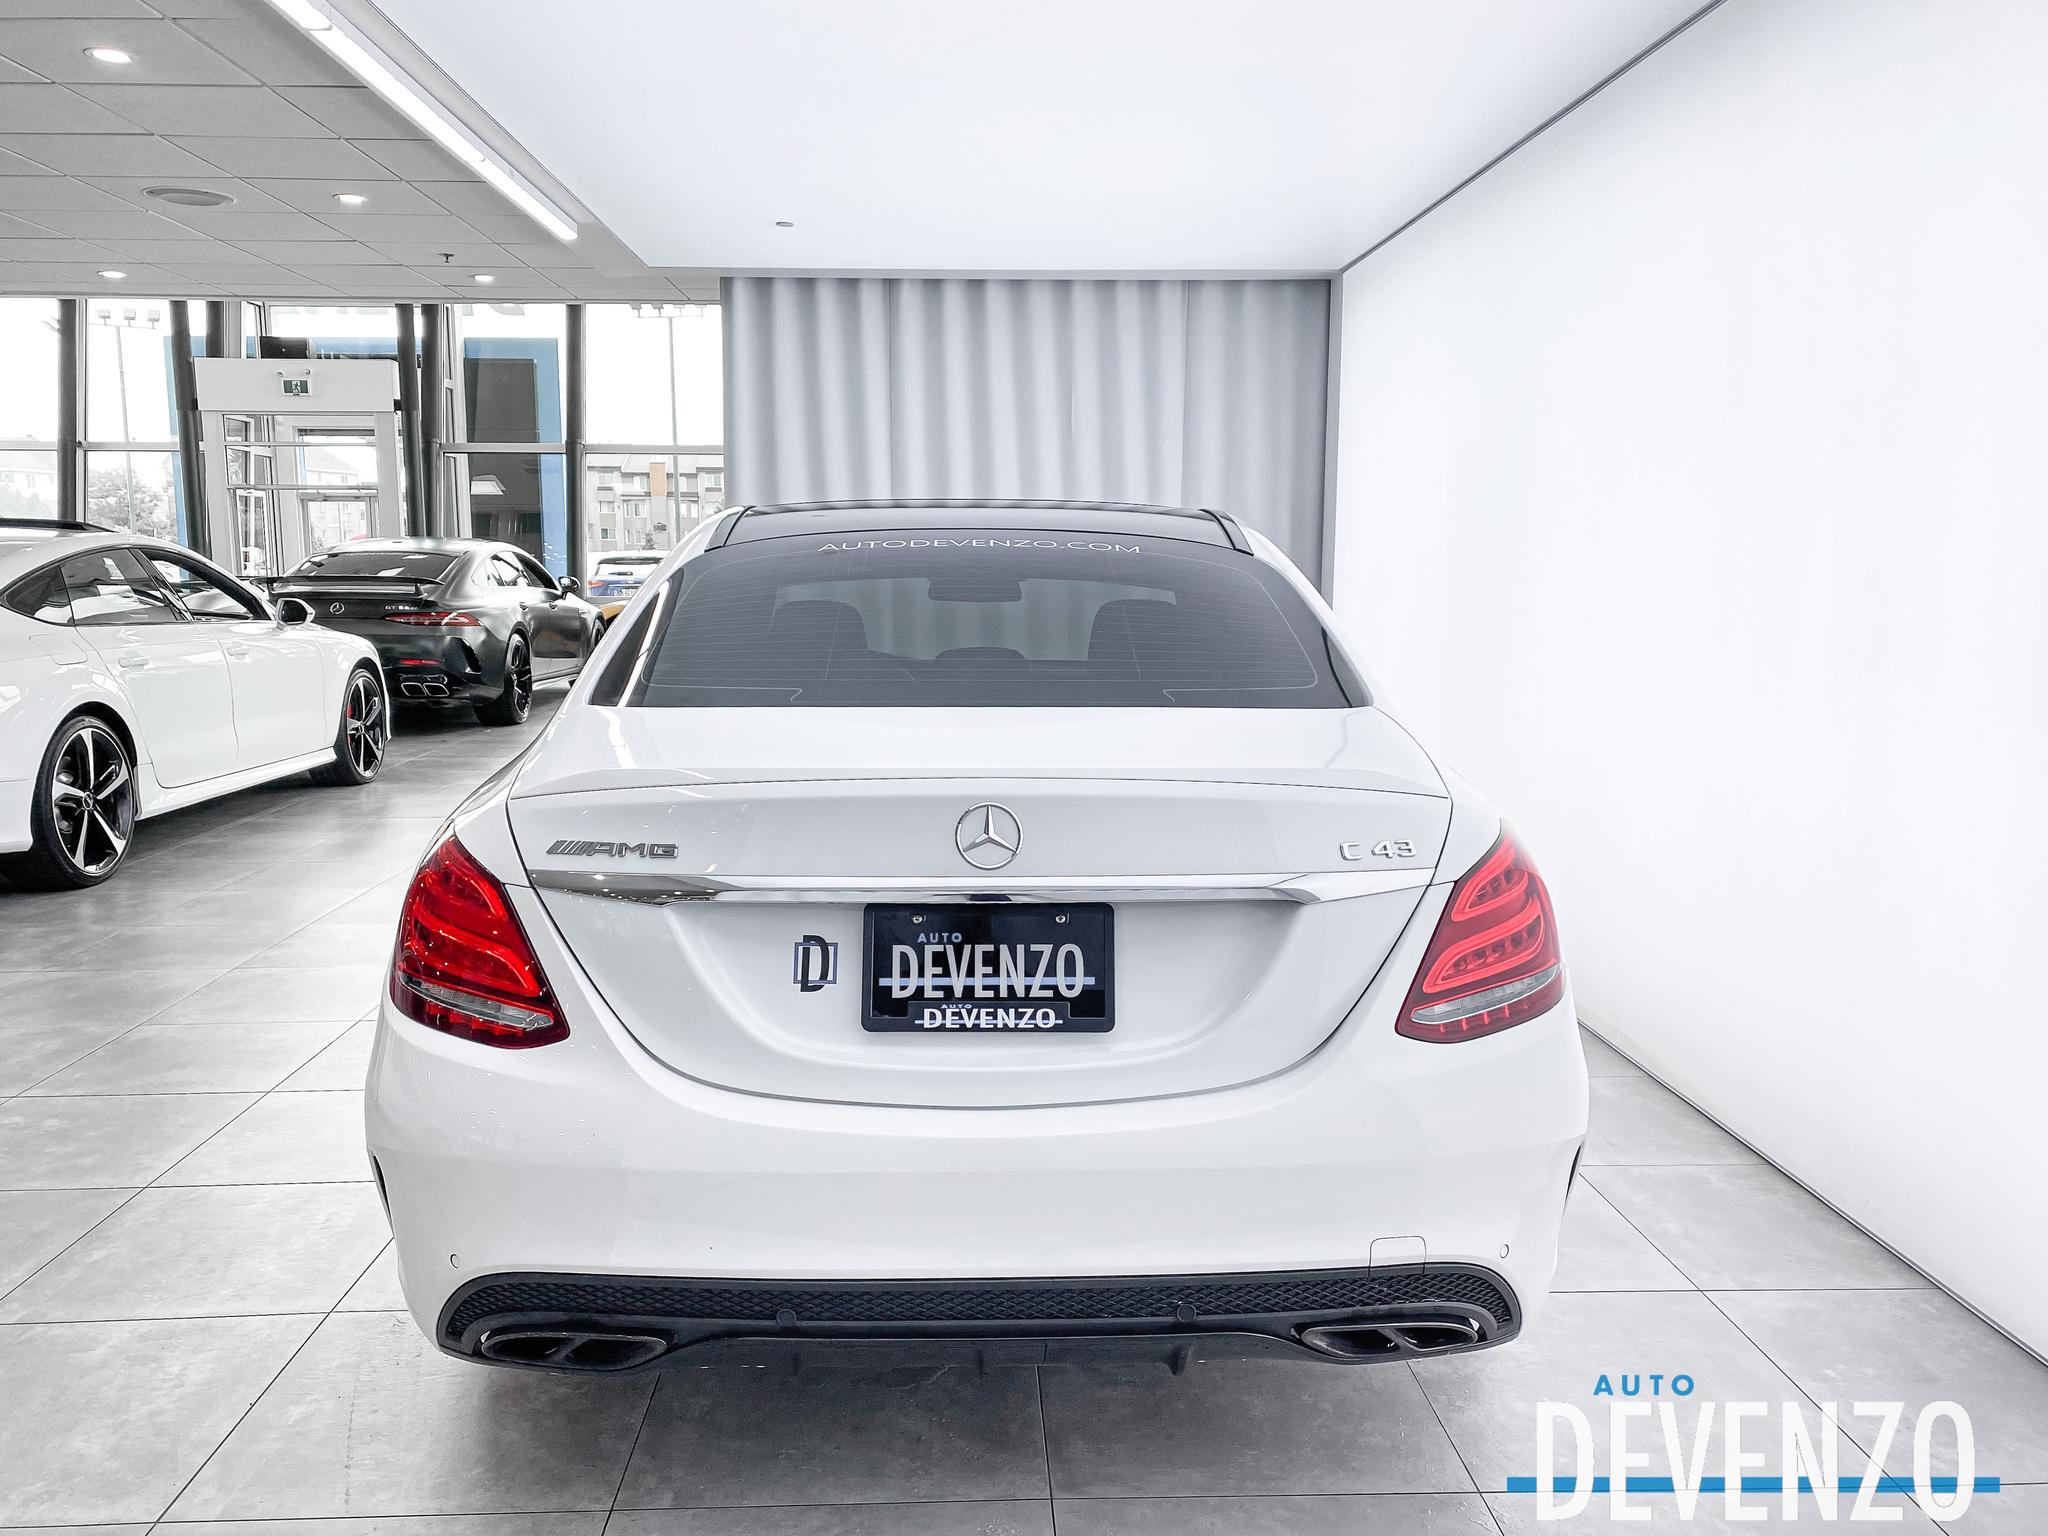 2018 Mercedes-Benz C-Class AMG C43 4MATIC INTELLIGENT DRIVE / NIGHT + DRIVERS complet